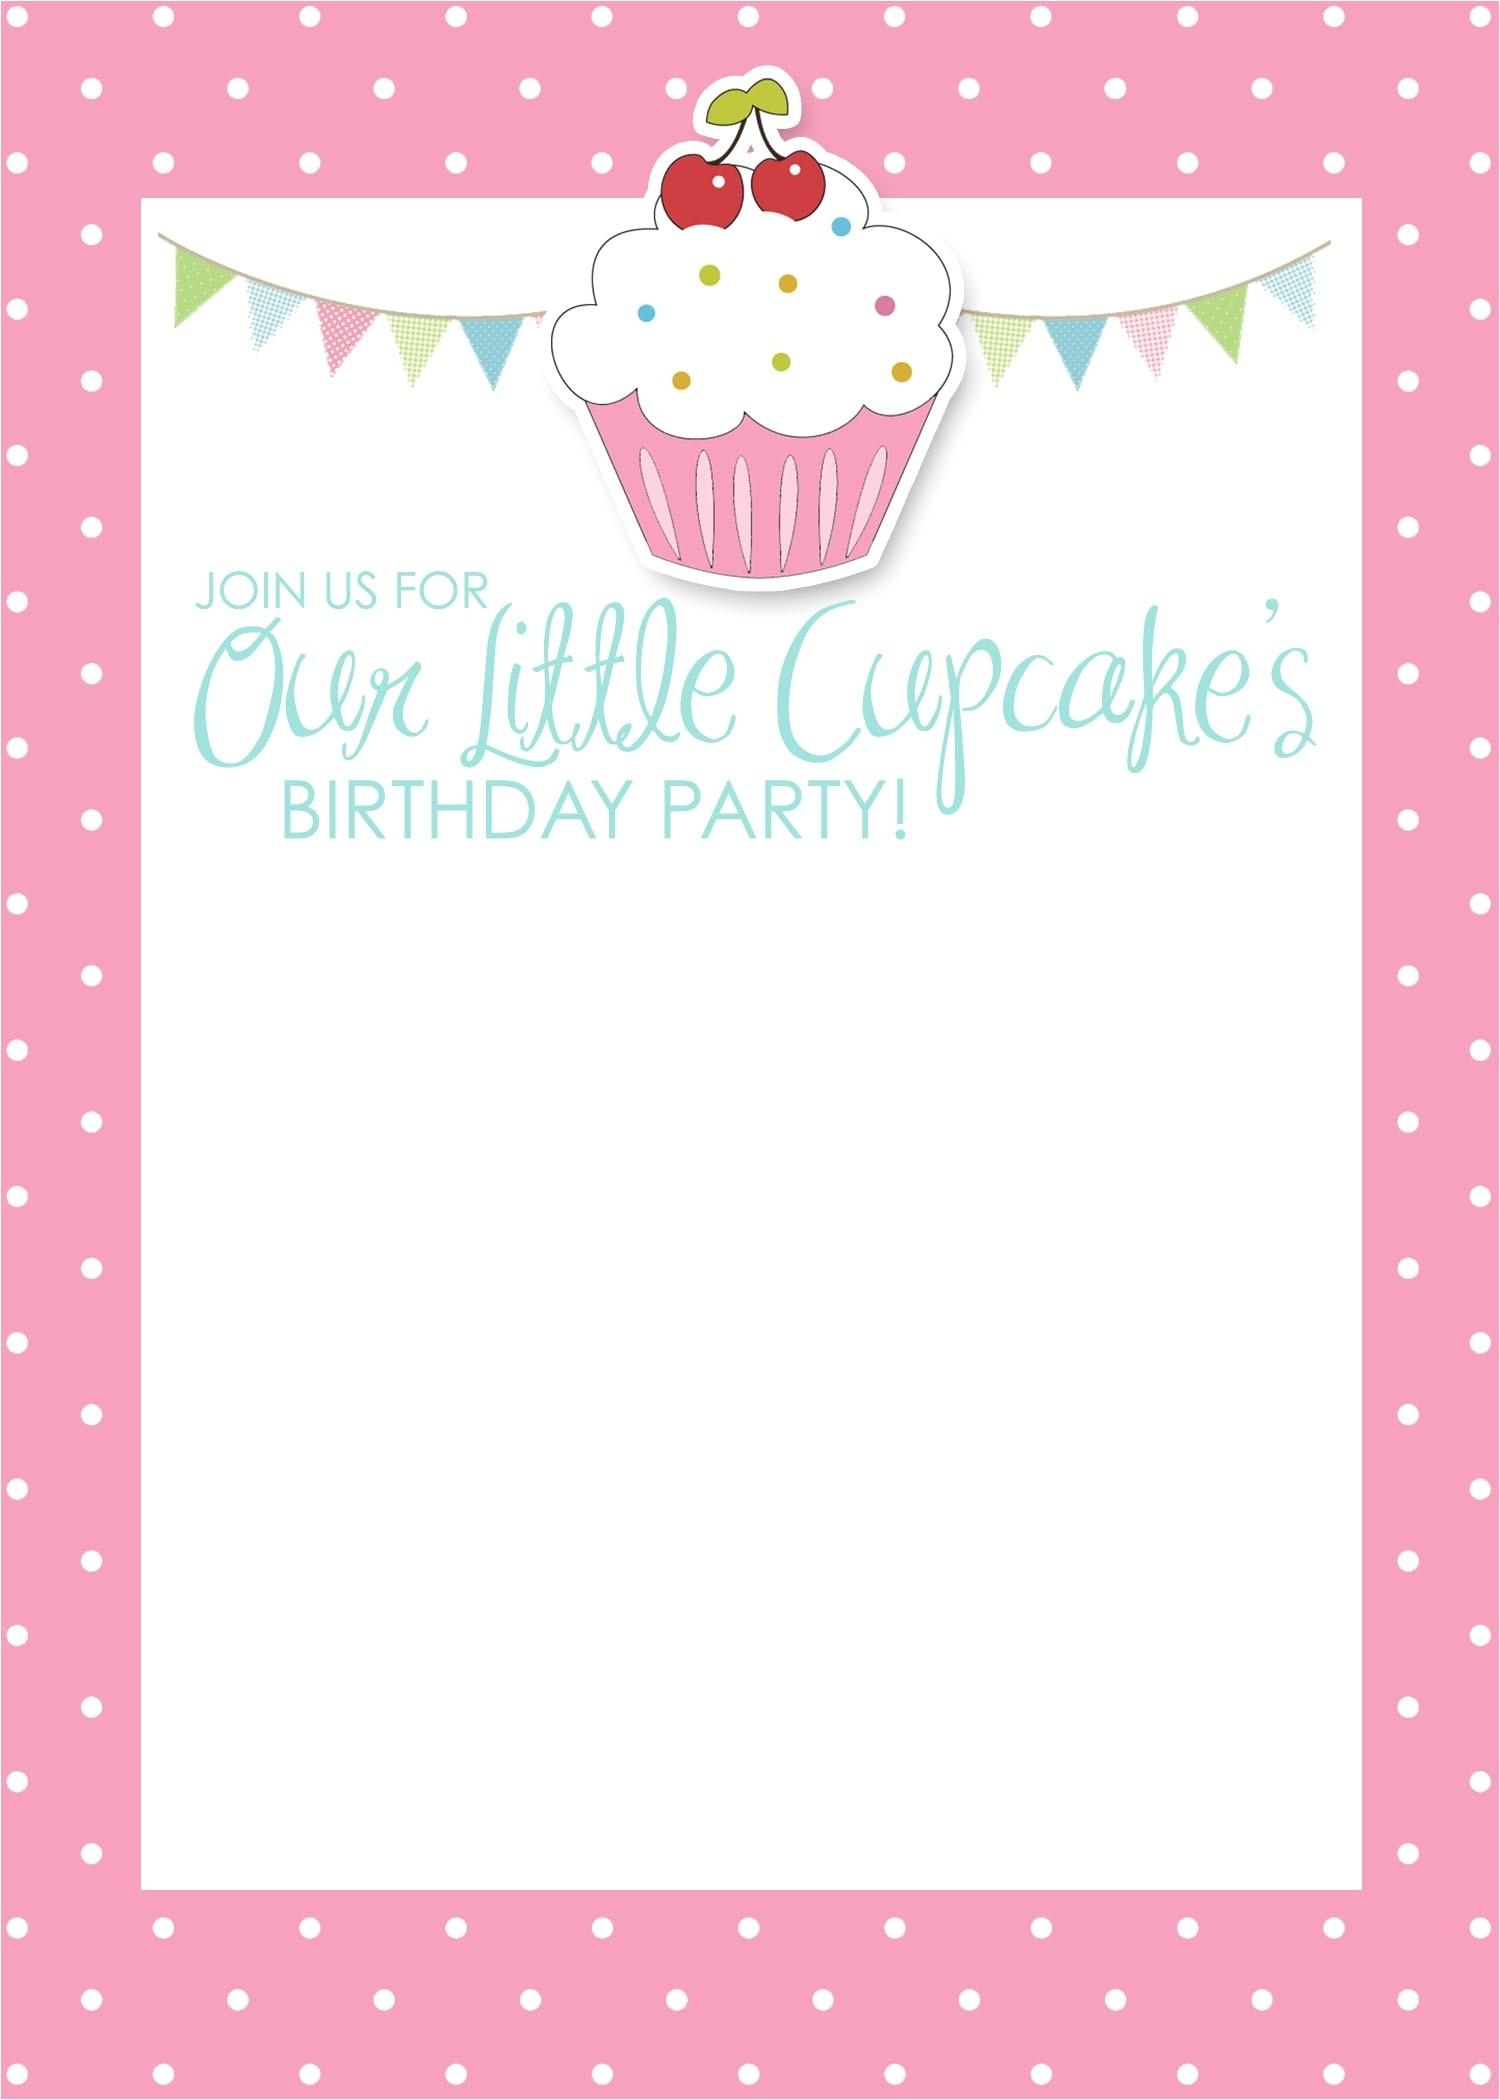 Girly Birthday Invitations Free Printable Free Printable Birthday Invitations for Girls Template